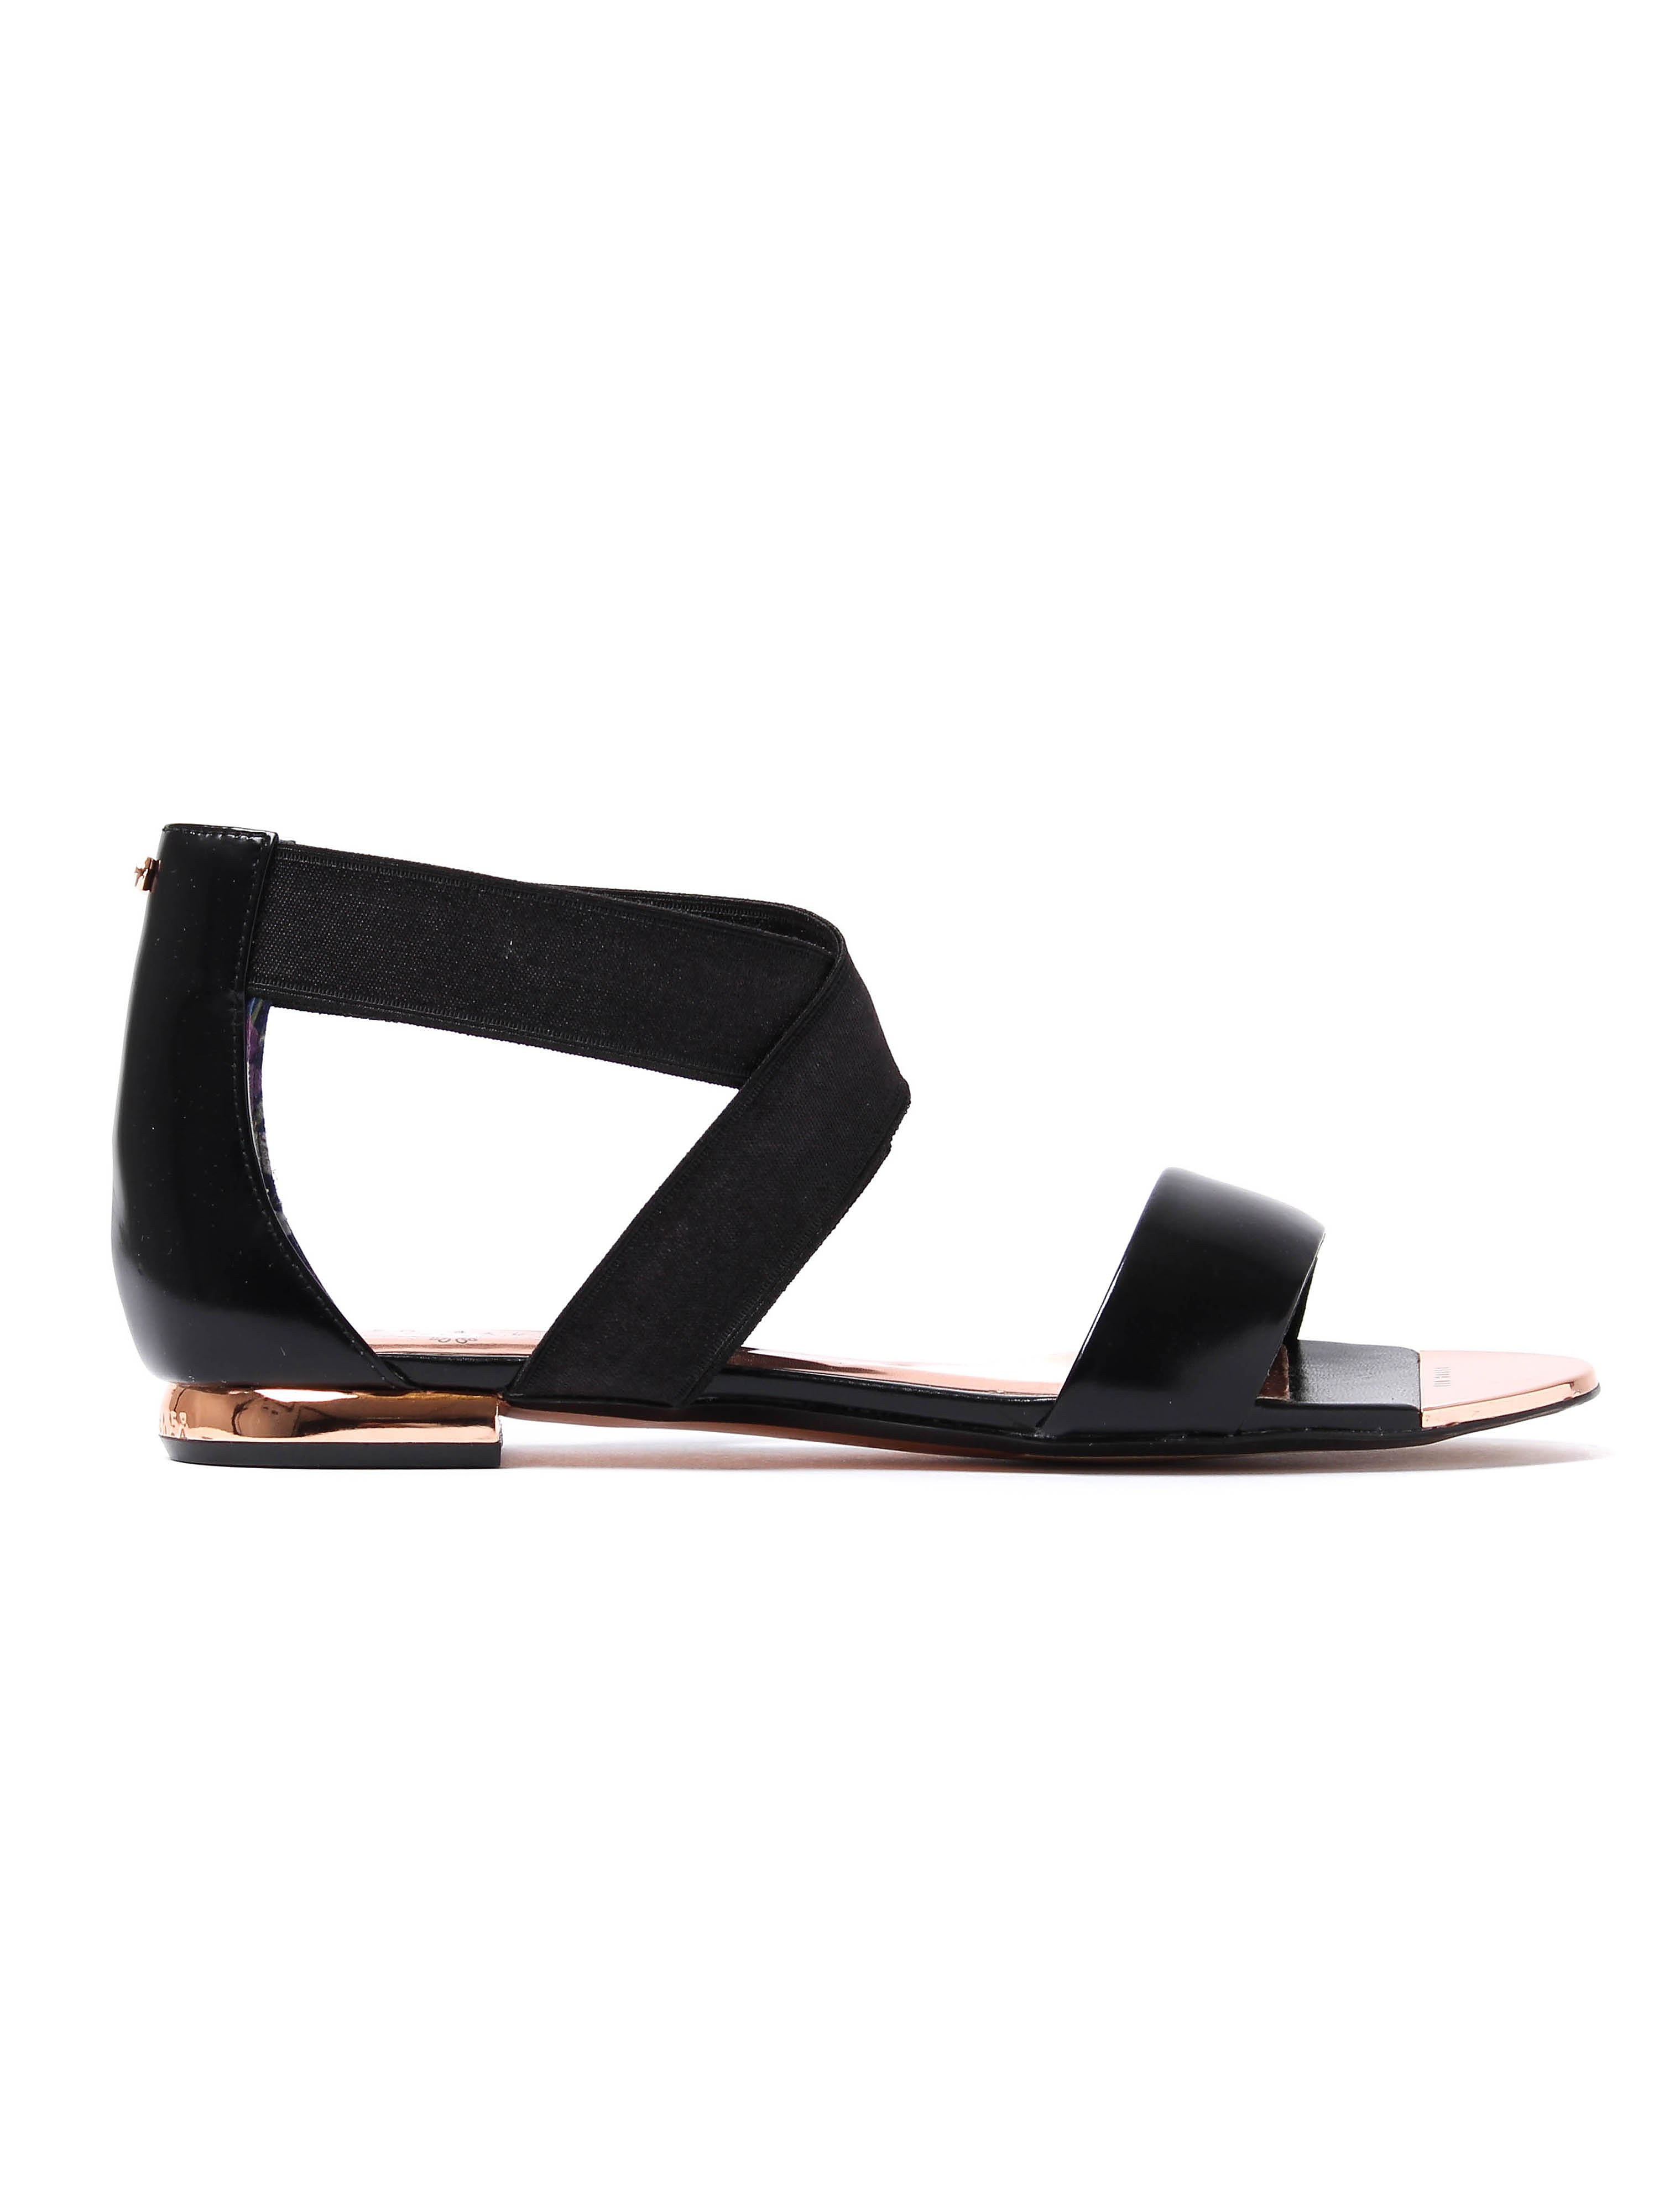 Ted Baker Women's Laana Criss Cross Strap Sandals - Black Leather